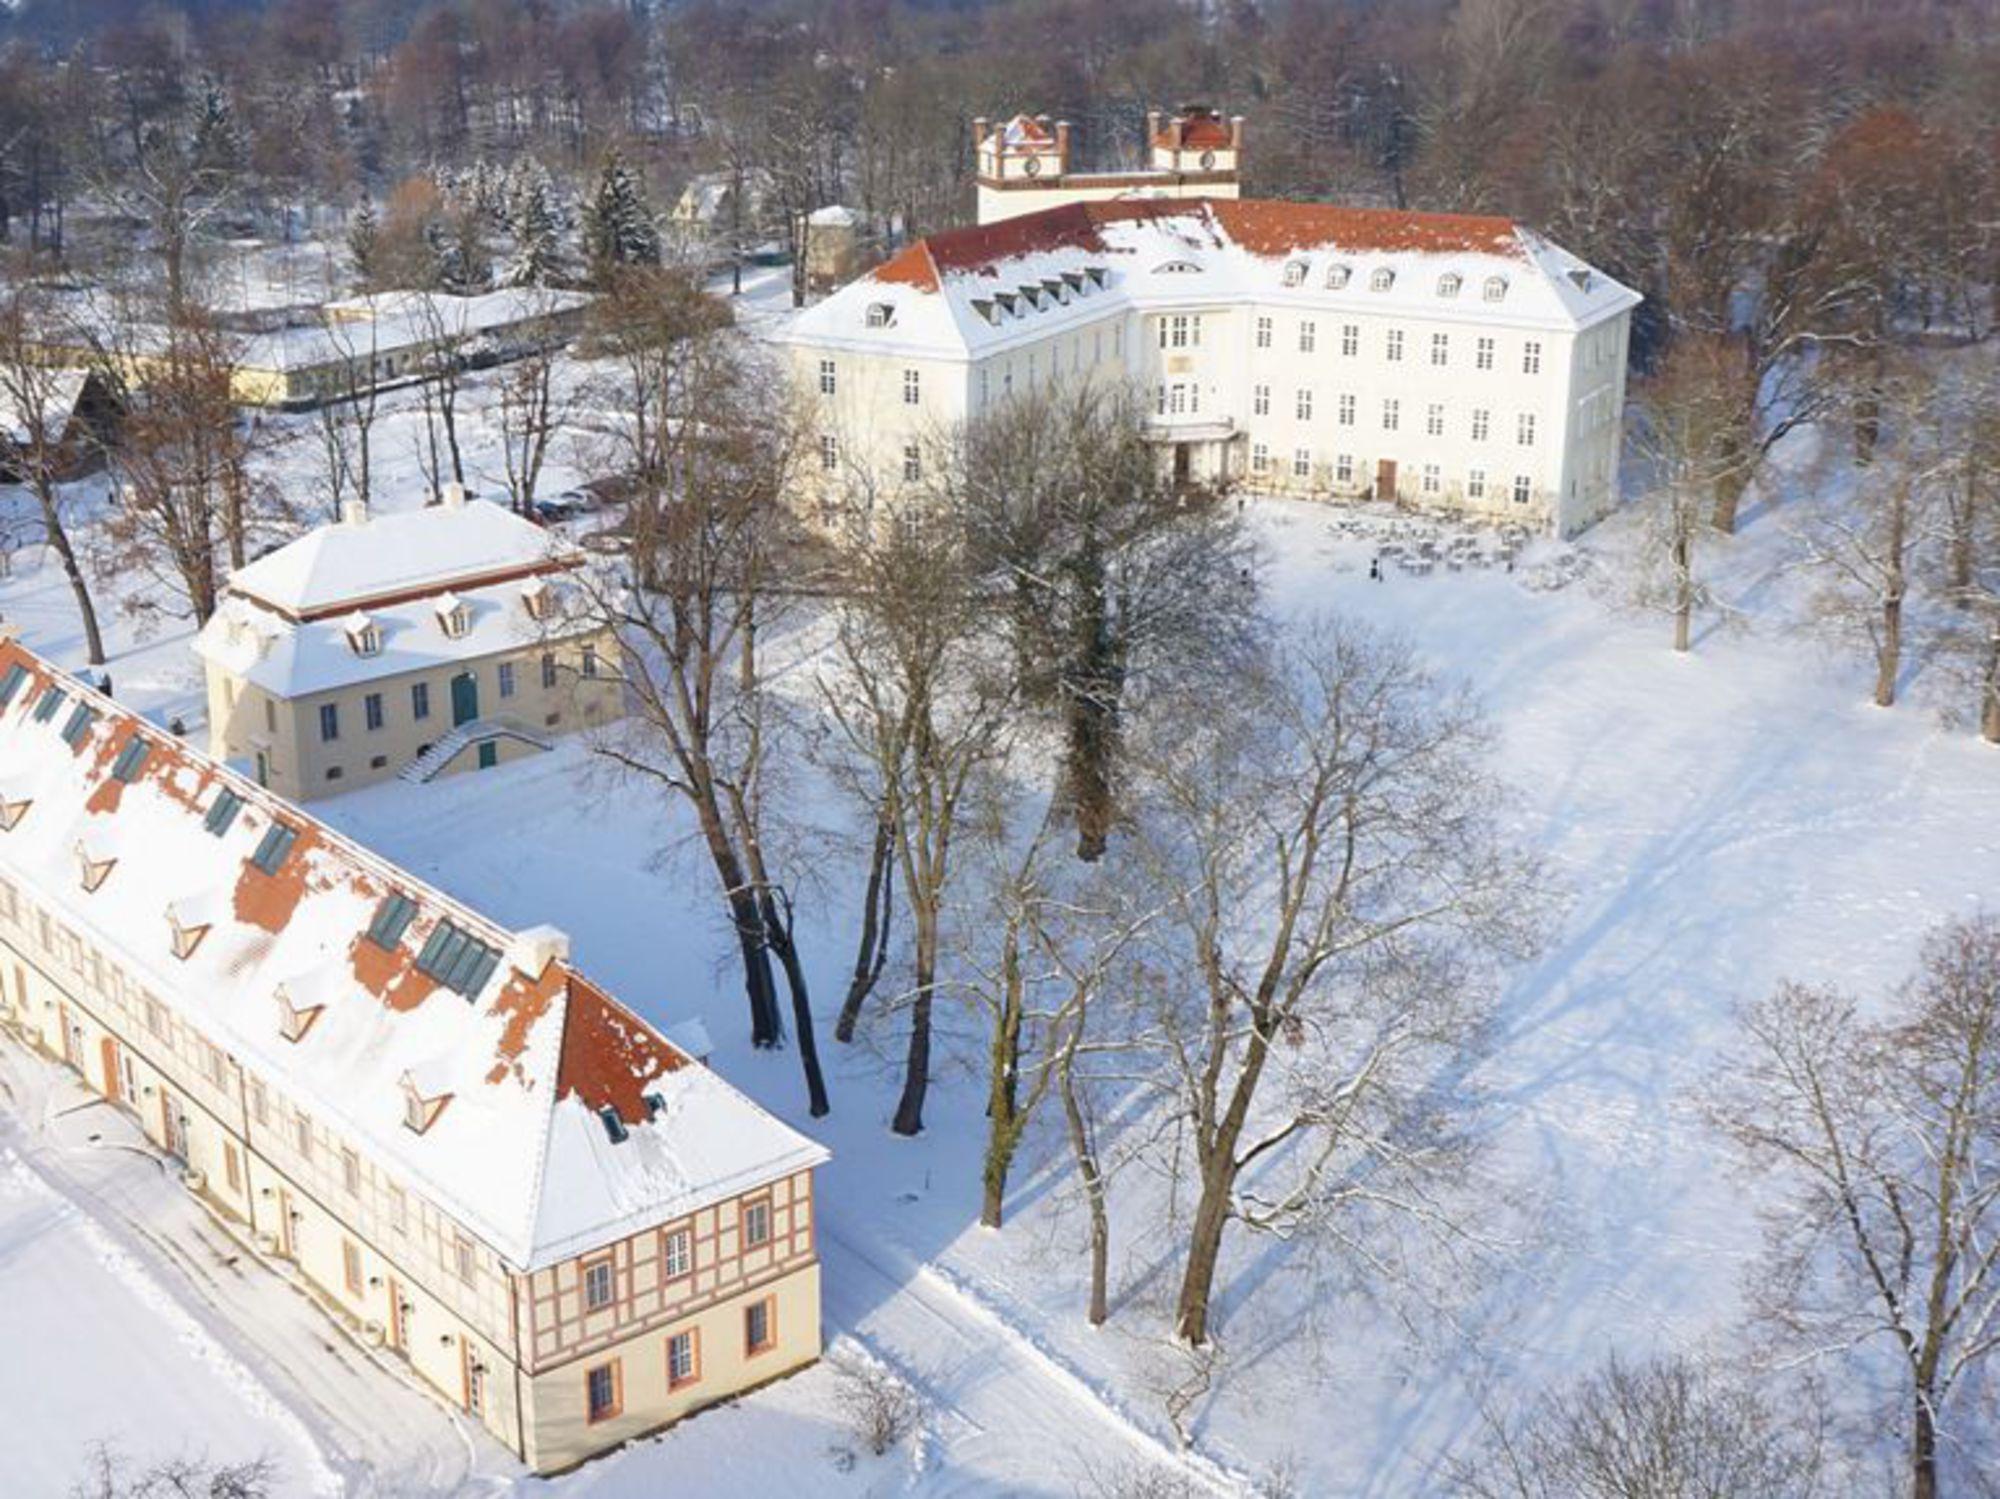 Urlaub im Schloss - Restaurant Spreewald - Urlaub Spreewald - Schlosshotel Brandenburg - Schloss Lübbenau im Spreewald